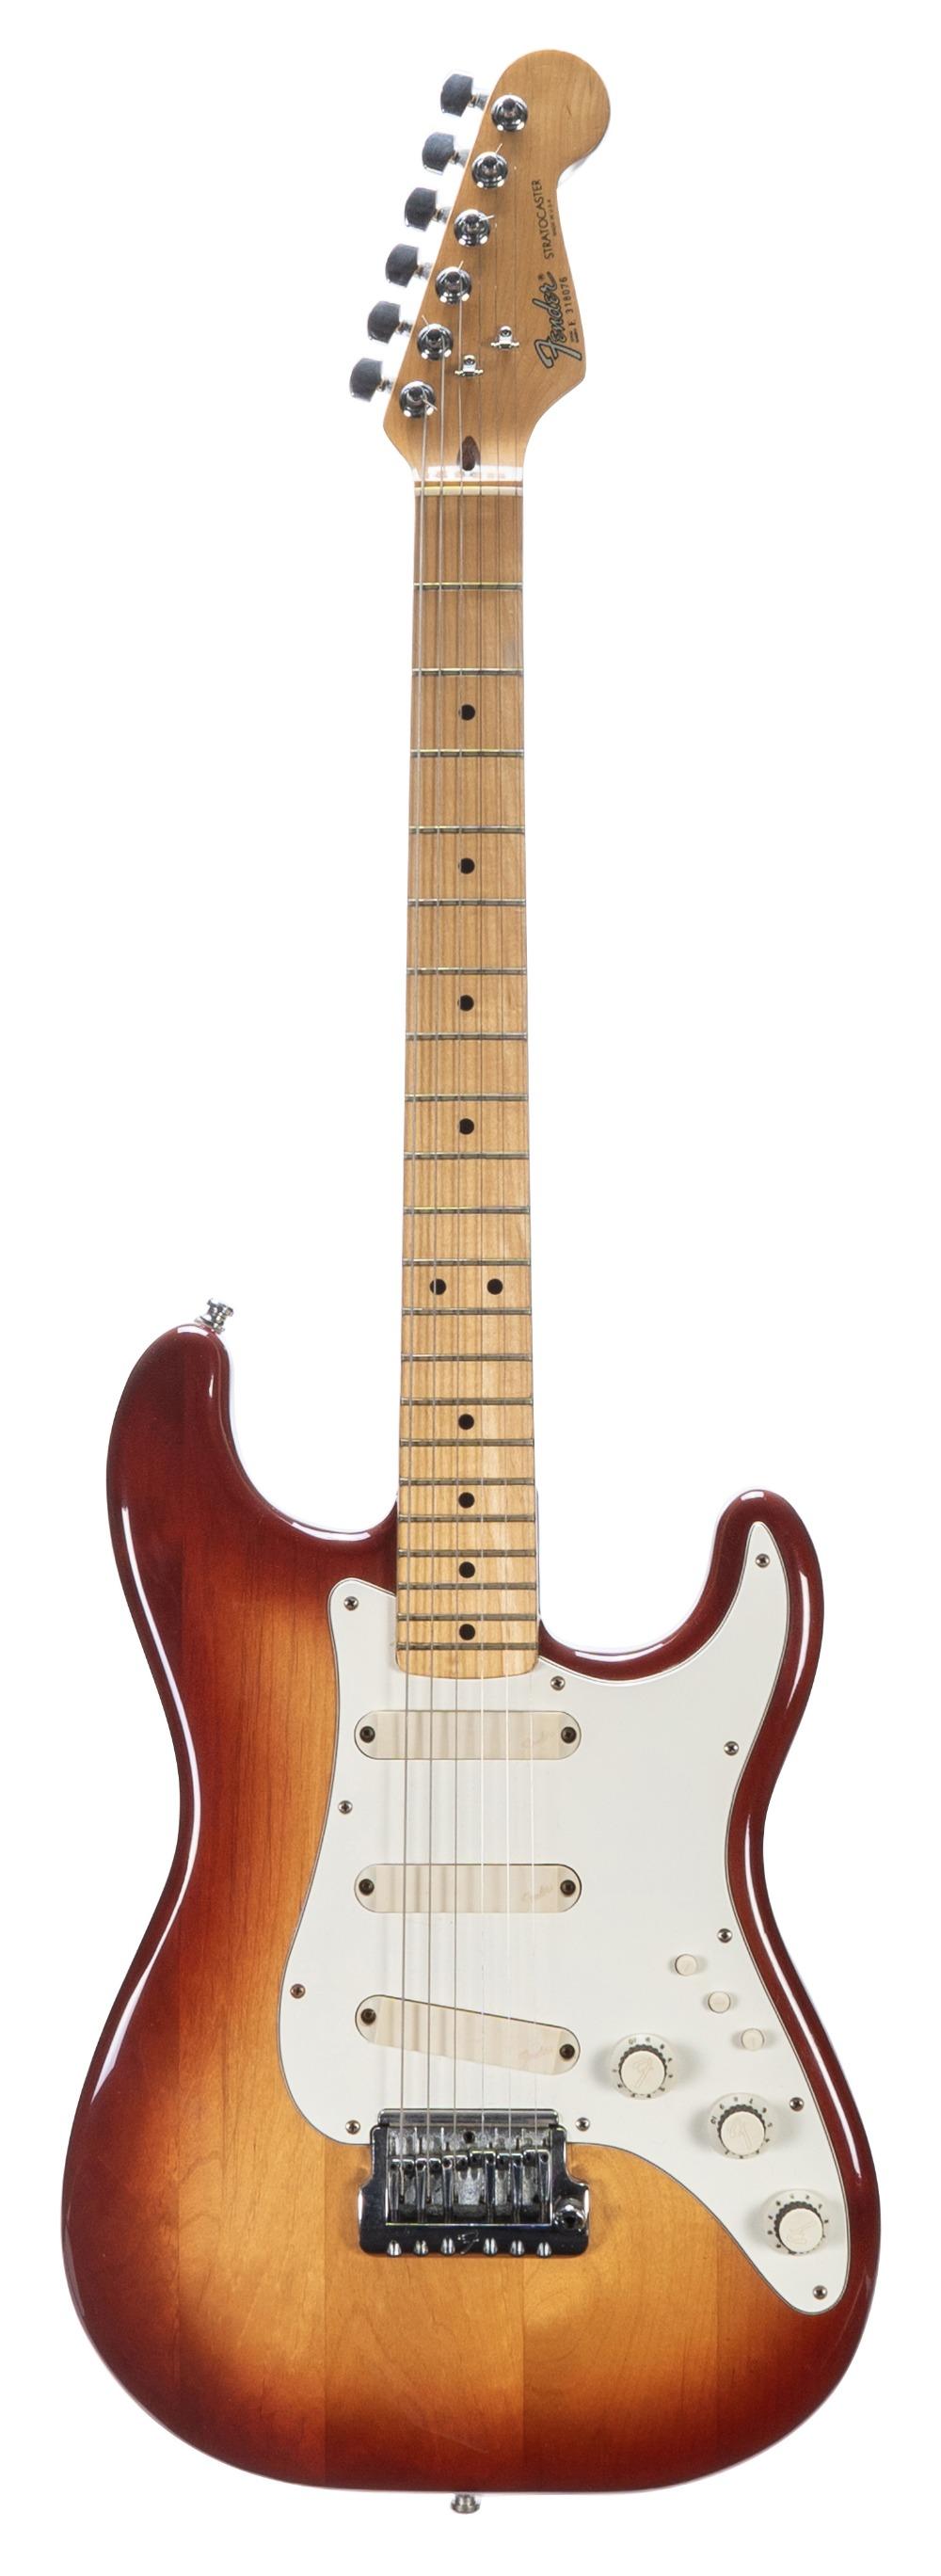 1983 Fender Stratocaster Elite electric guitar, made in USA, ser. no. E3xxx76; Finish: Sienna